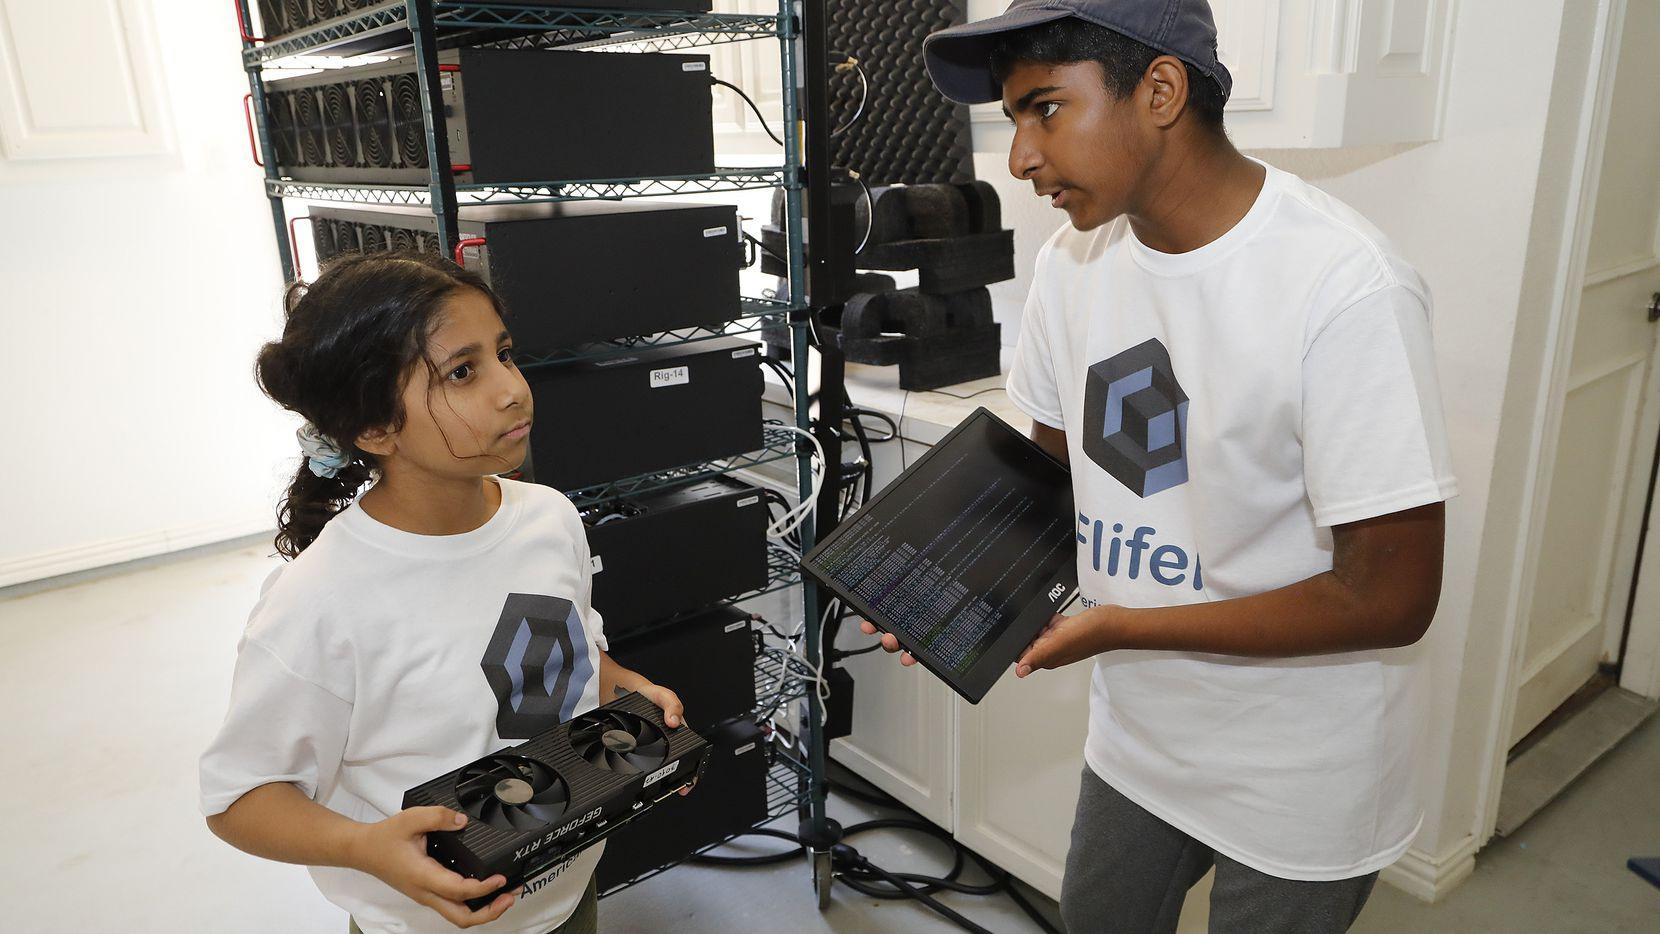 Cậu bé 14 tuổi kiếm 32.000 USD/tháng nhờ khai thác Ethereum - VietNamNet